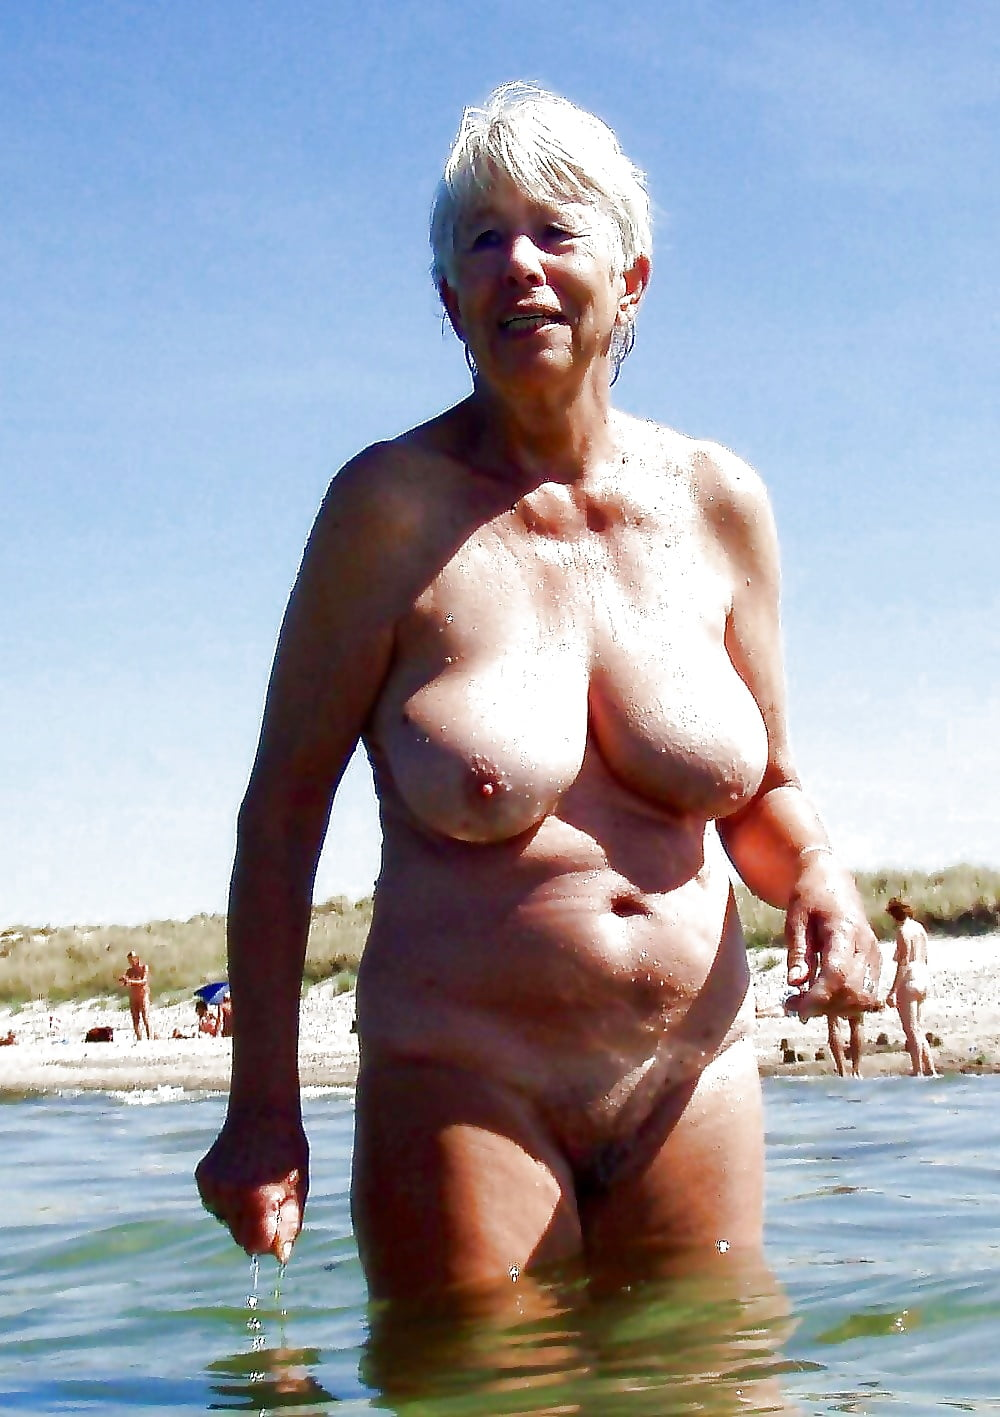 грубо пожилая на пляже эротика фото раздумывая, ударила